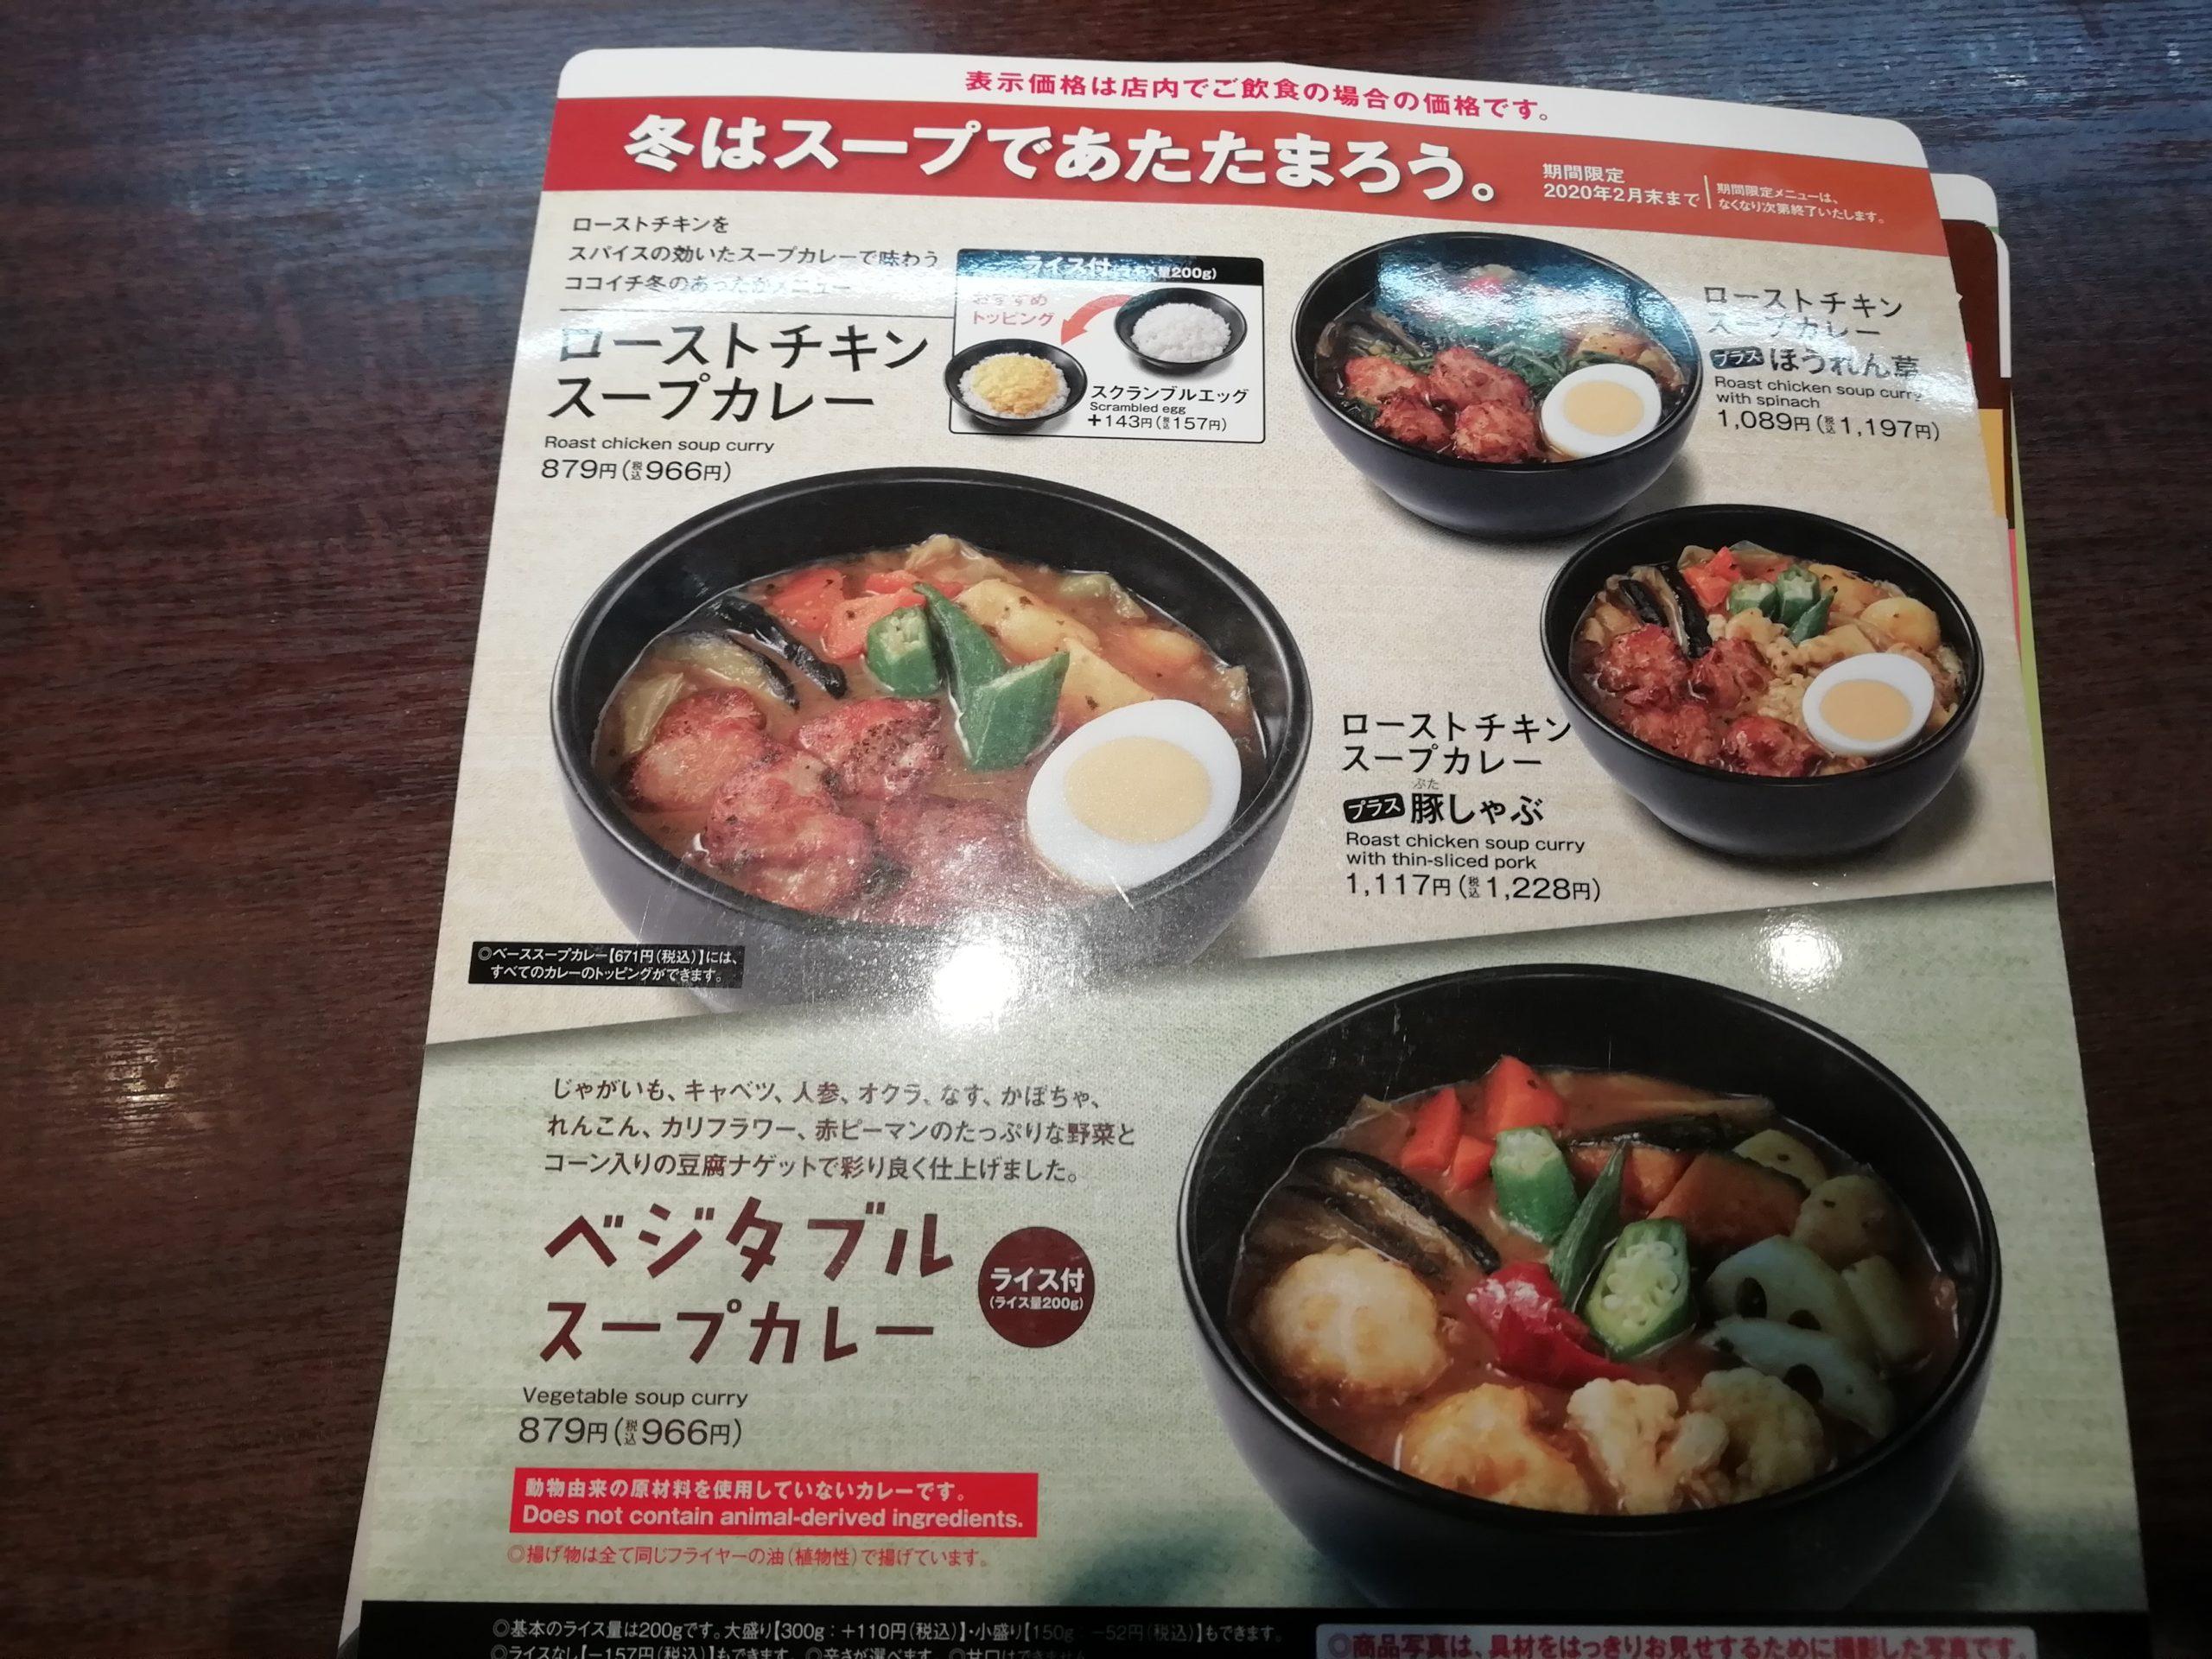 CoCo壱番屋 スープカレー メニュー